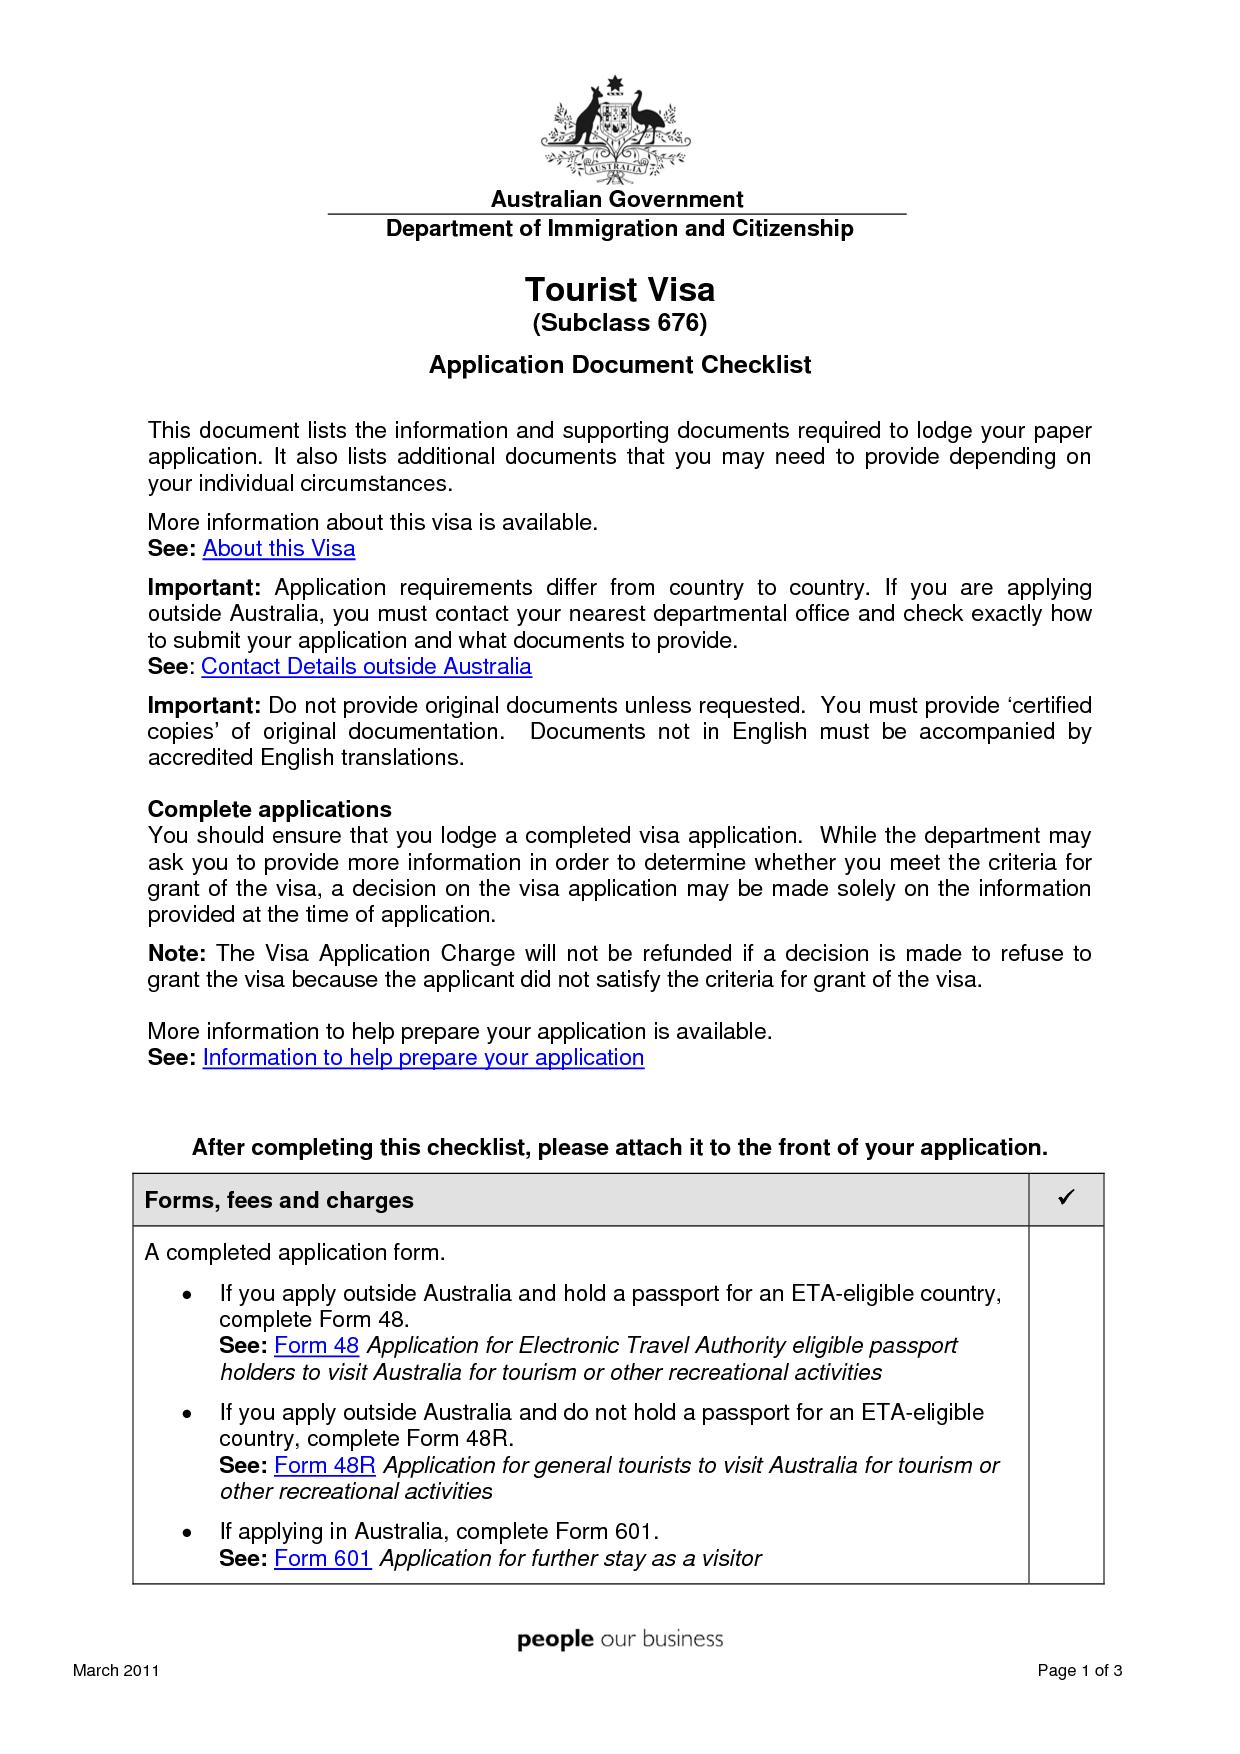 Cover Letter Australian Tourist Visa 1754 1240px Visa Request Letter Letter Sample Format And Fre Business Letter Template Cover Letter Sample Cover Letter